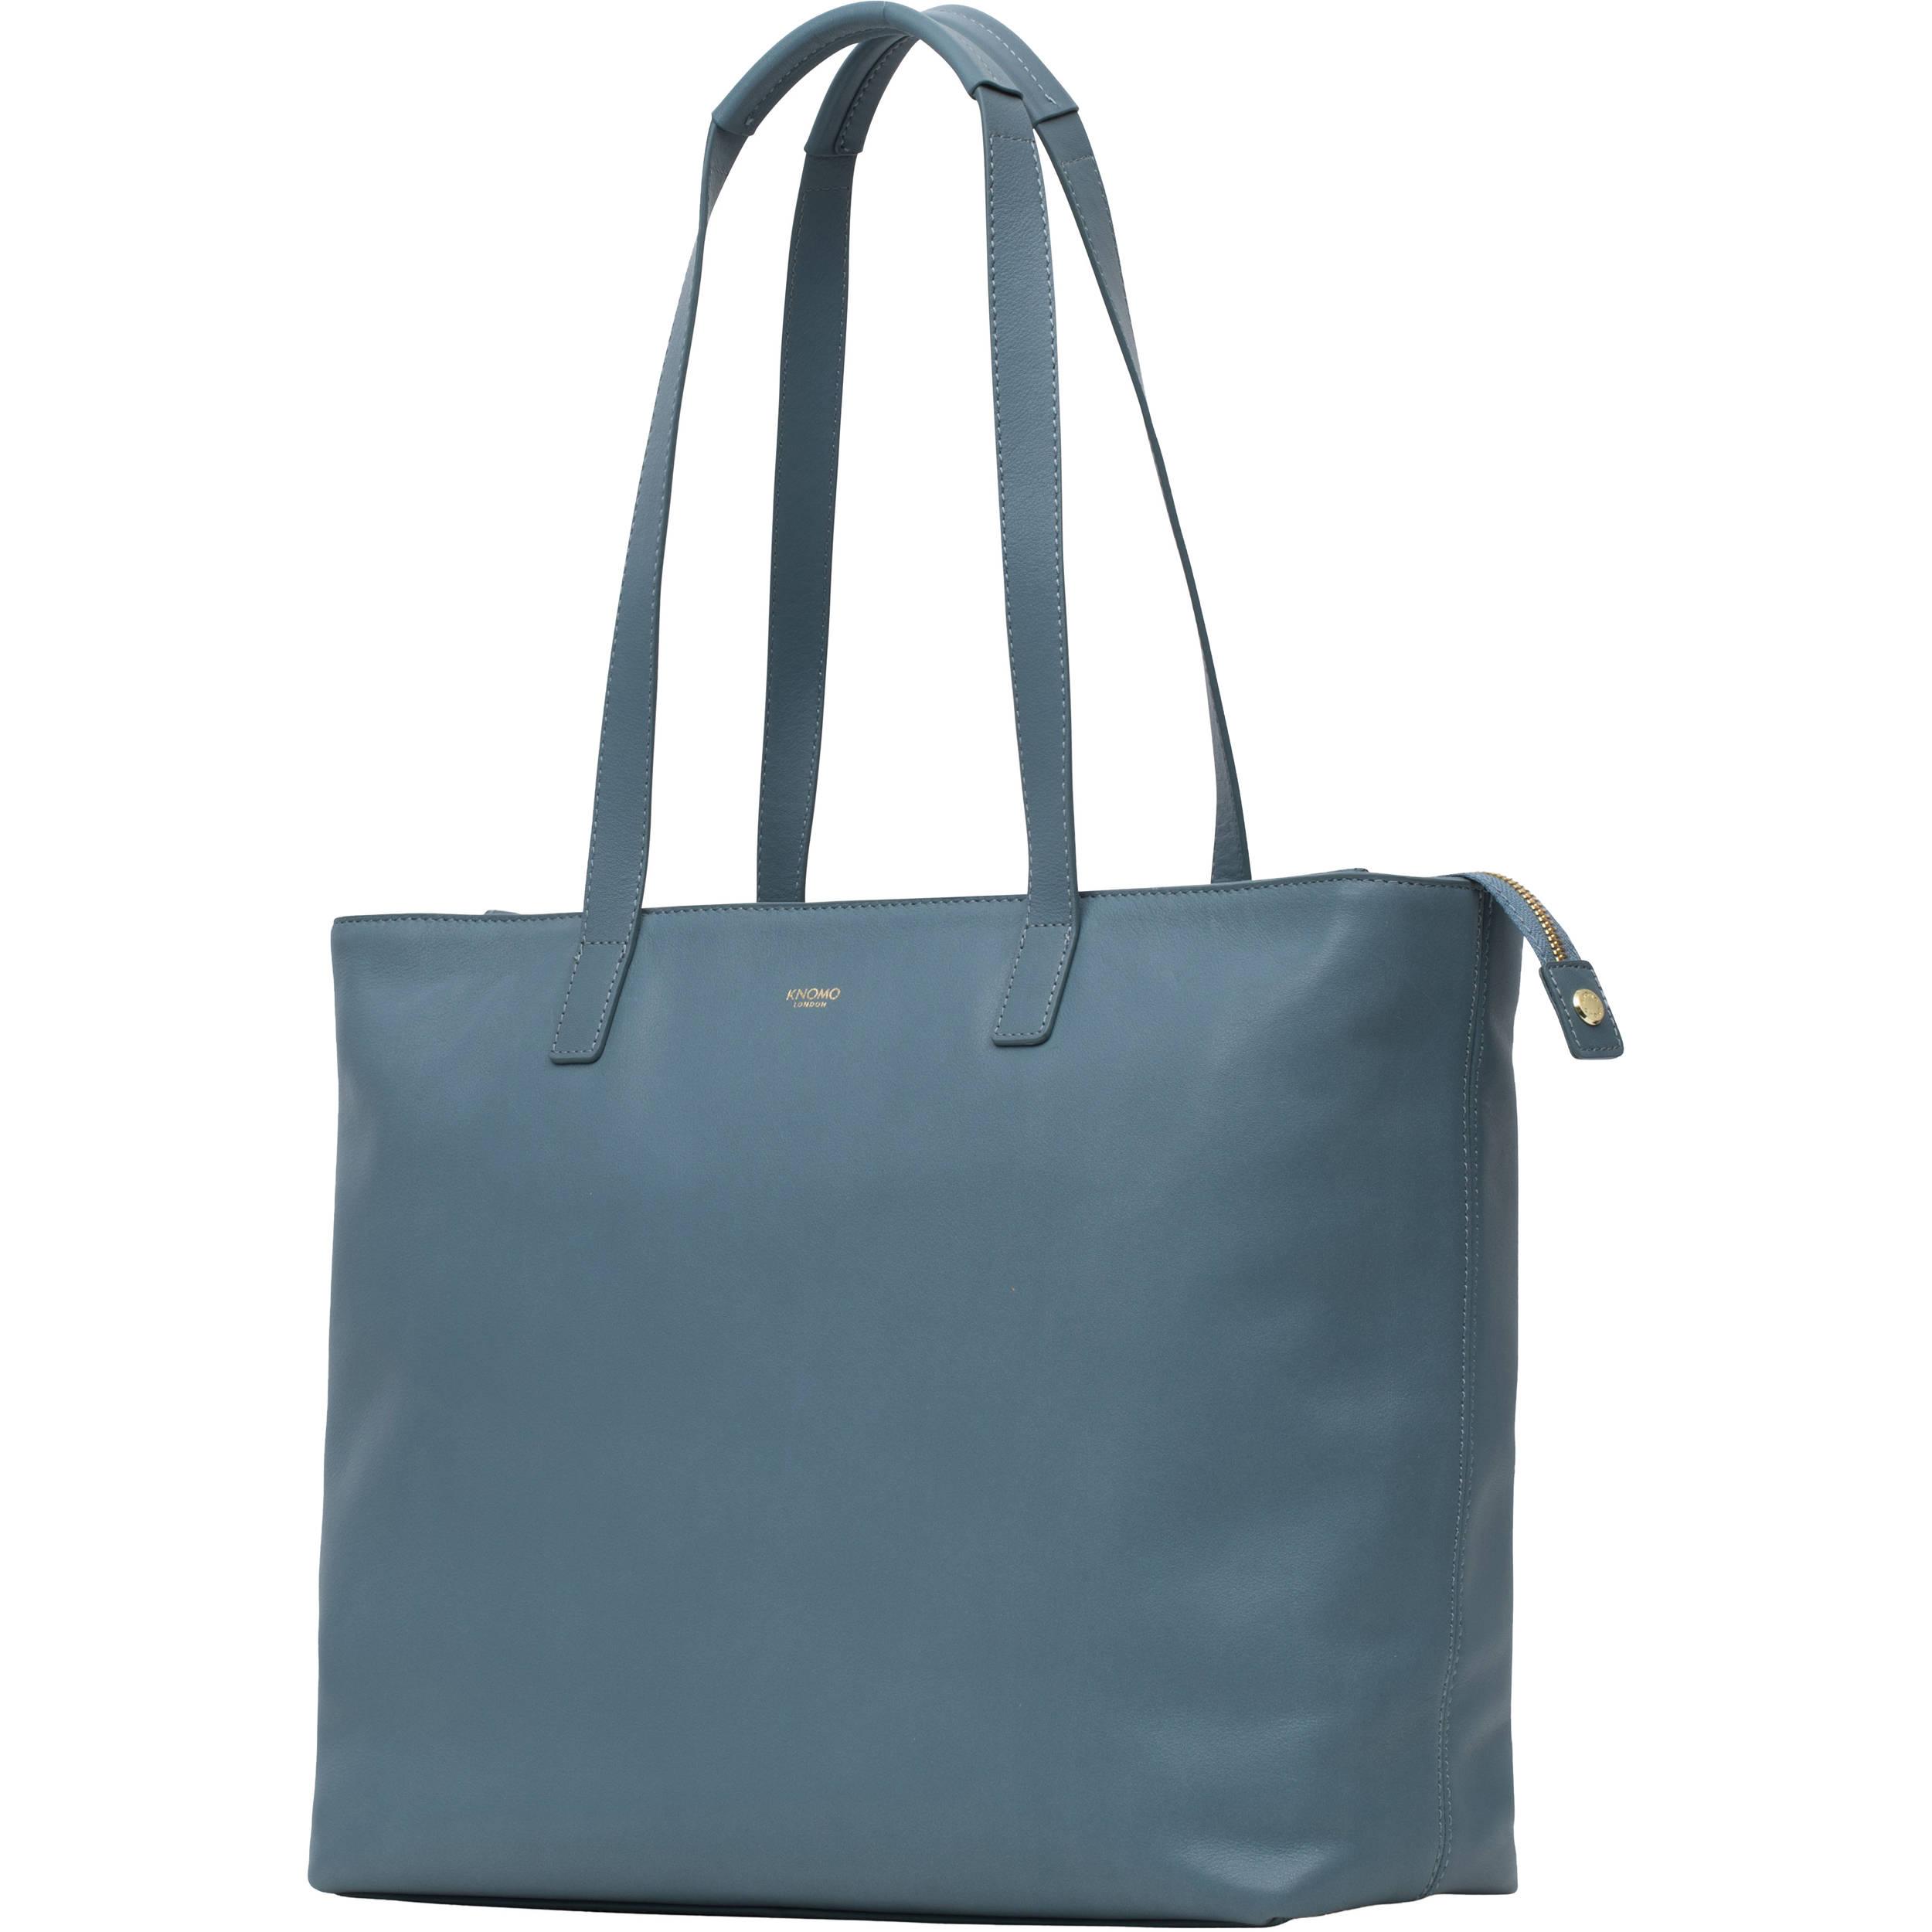 75c34f0ec1 KNOMO USA Maddox Leather Laptop Tote Bag 15